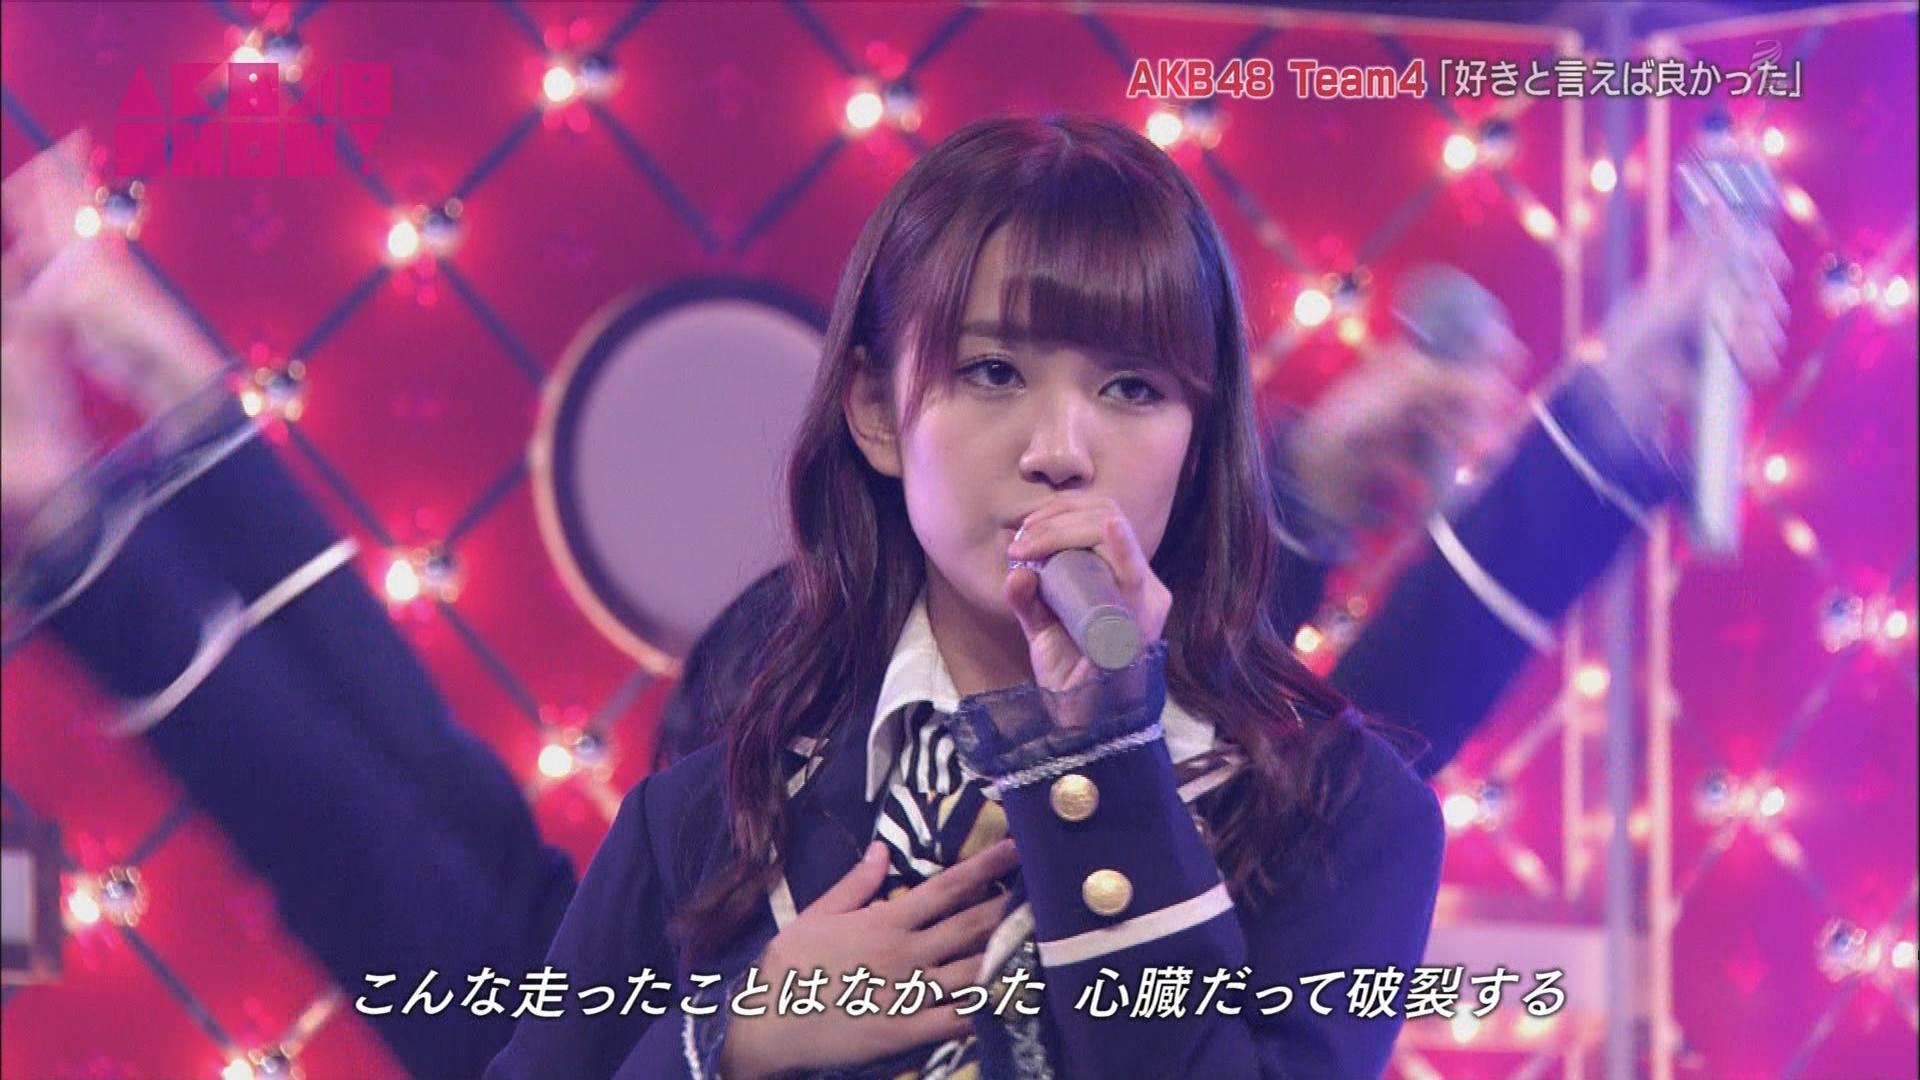 AKB48SHOW チーム4好きといえば良かった 加藤玲奈 20140830 (10)